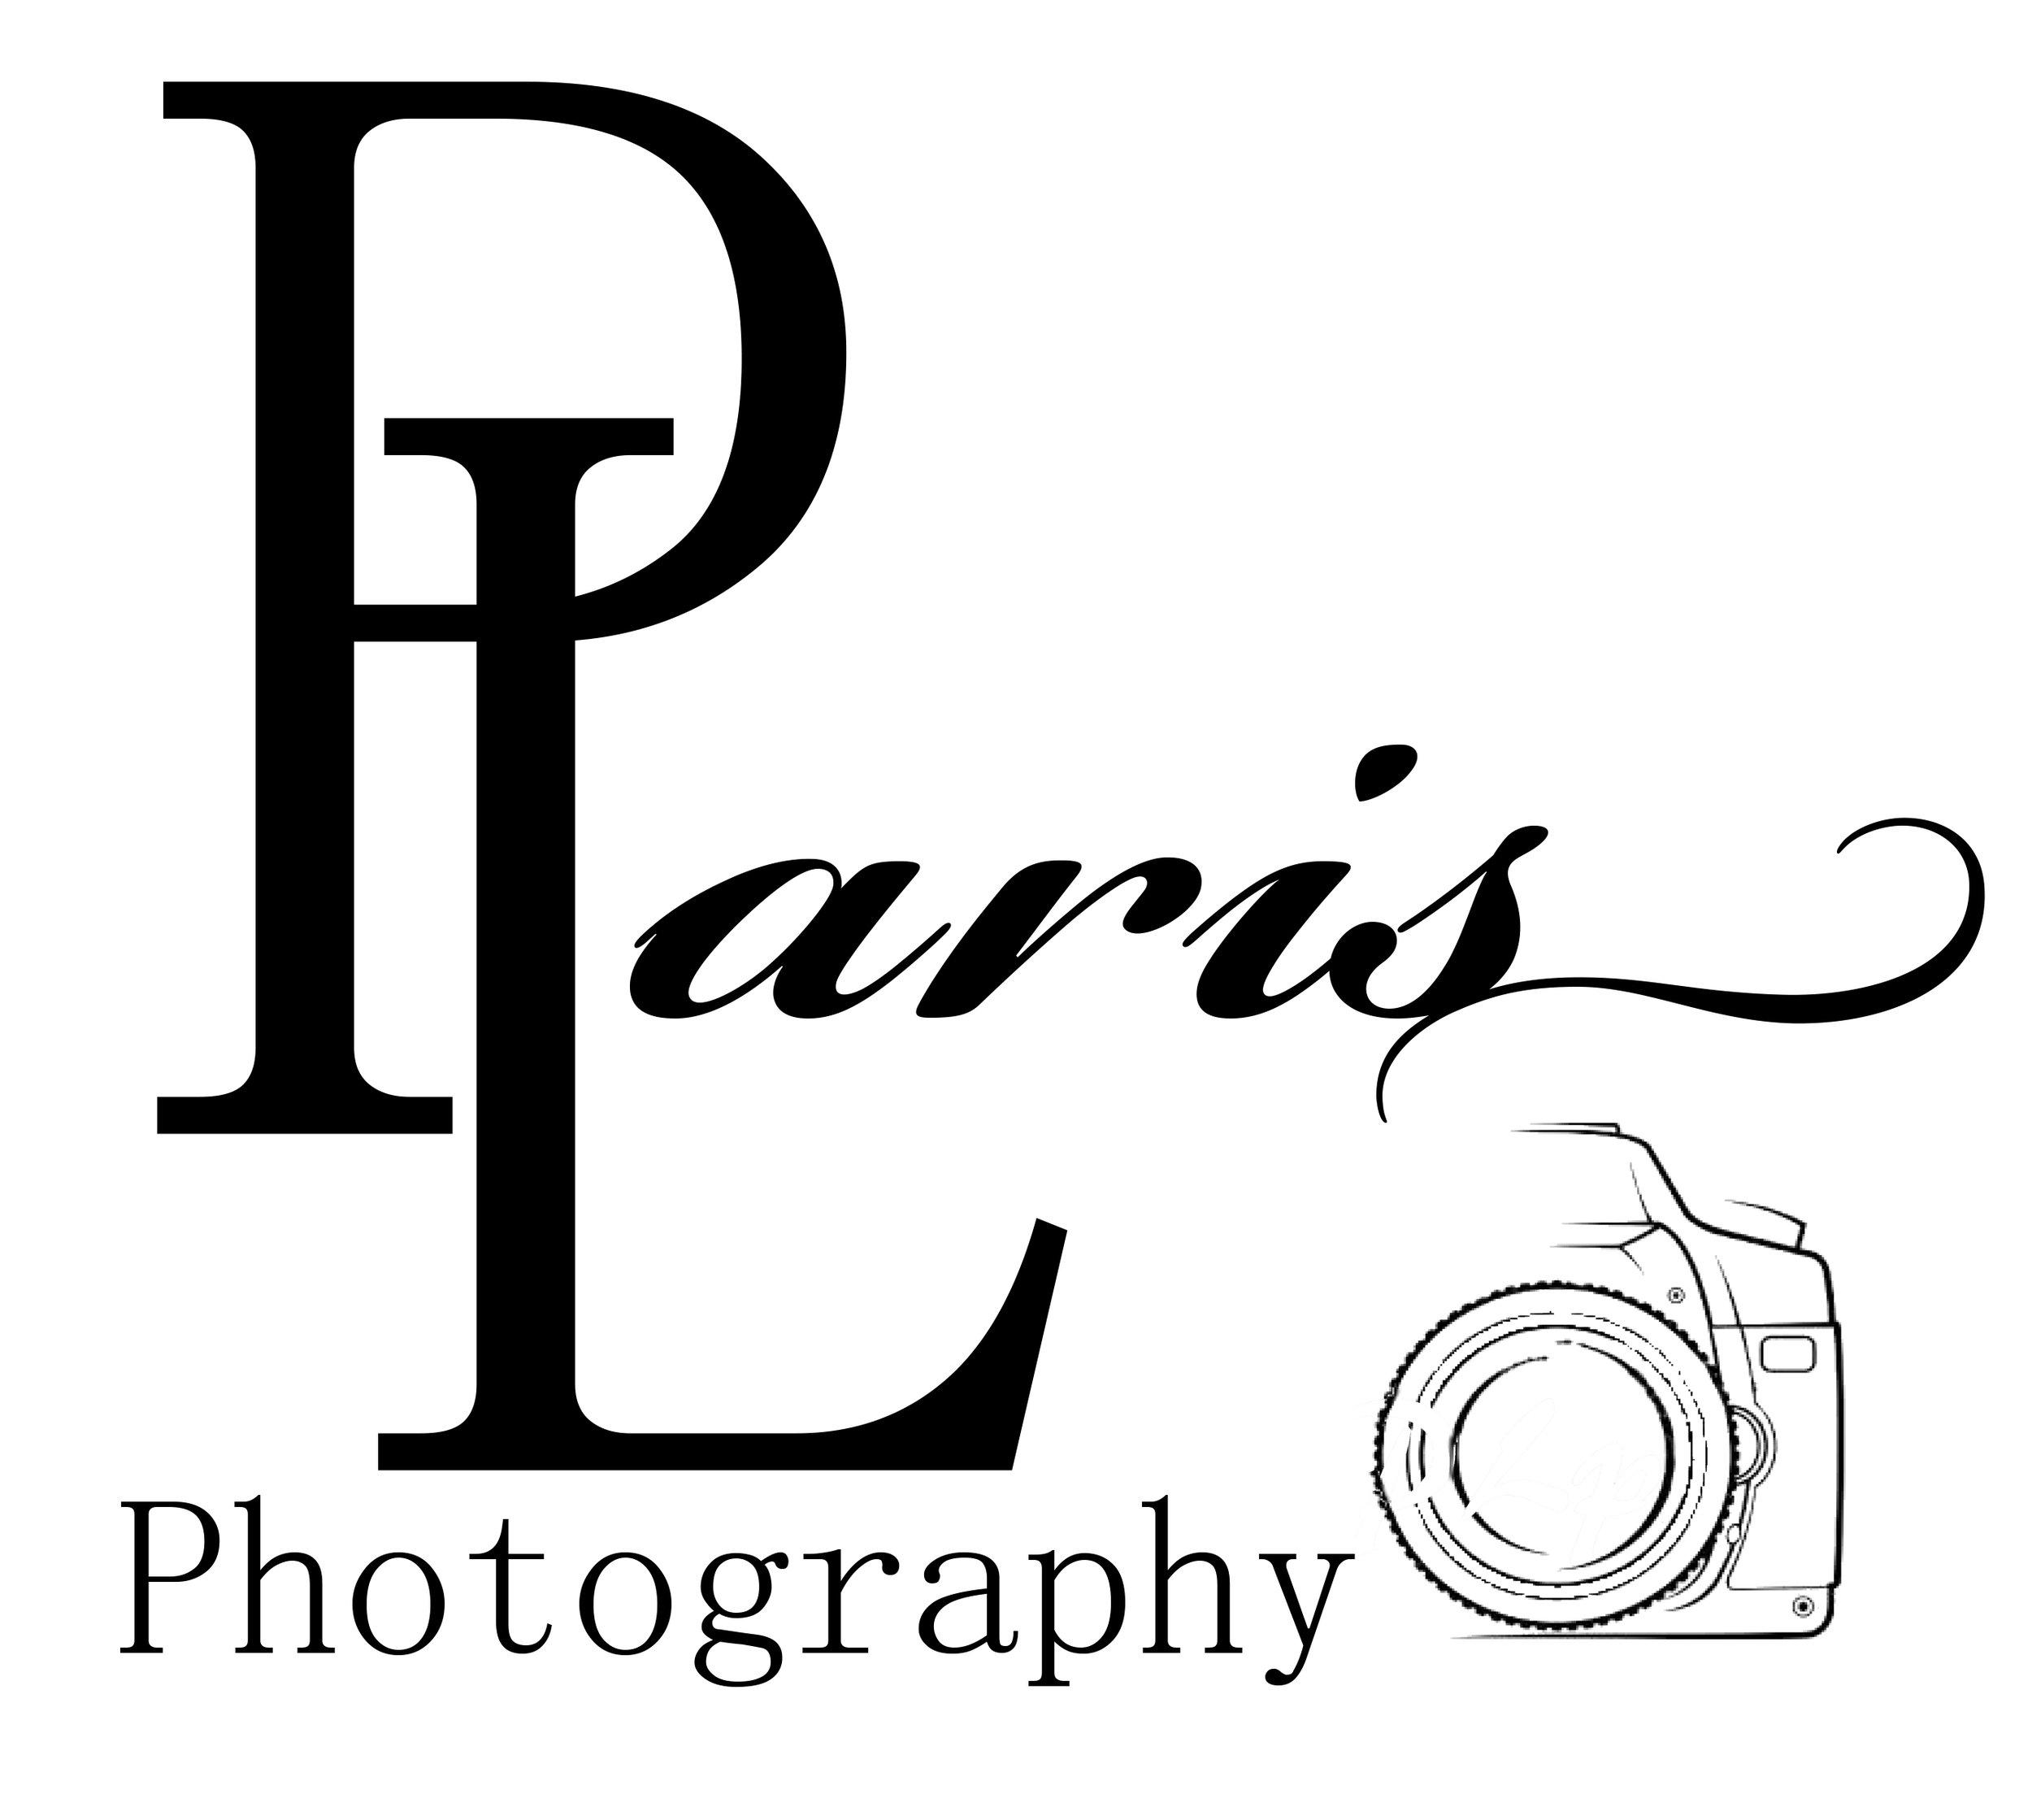 parislovephotography.jpg